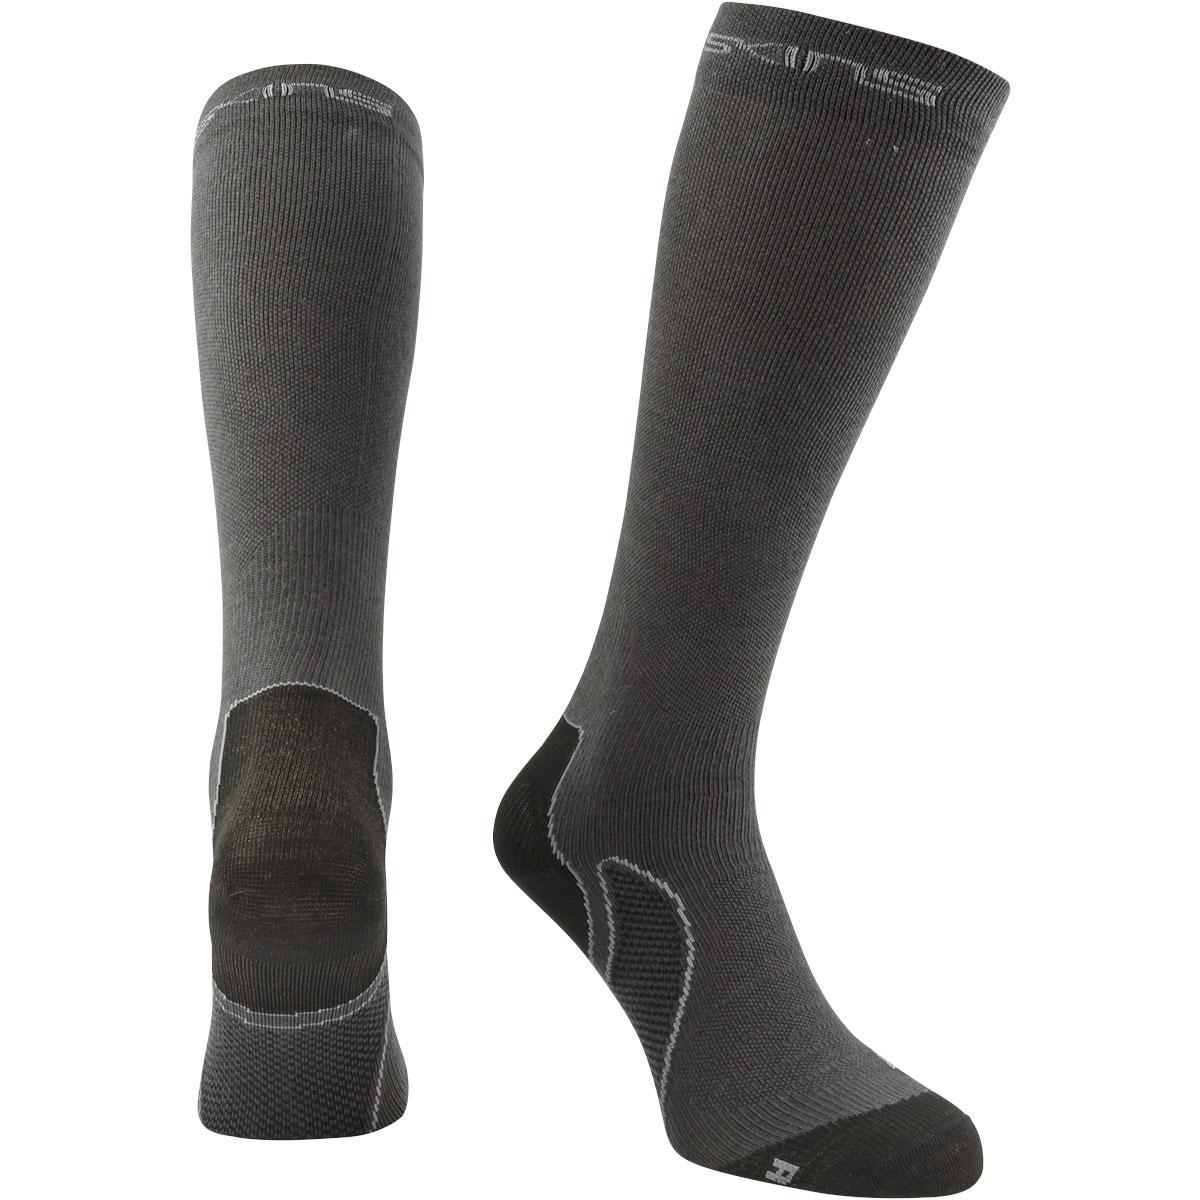 skins compression socks